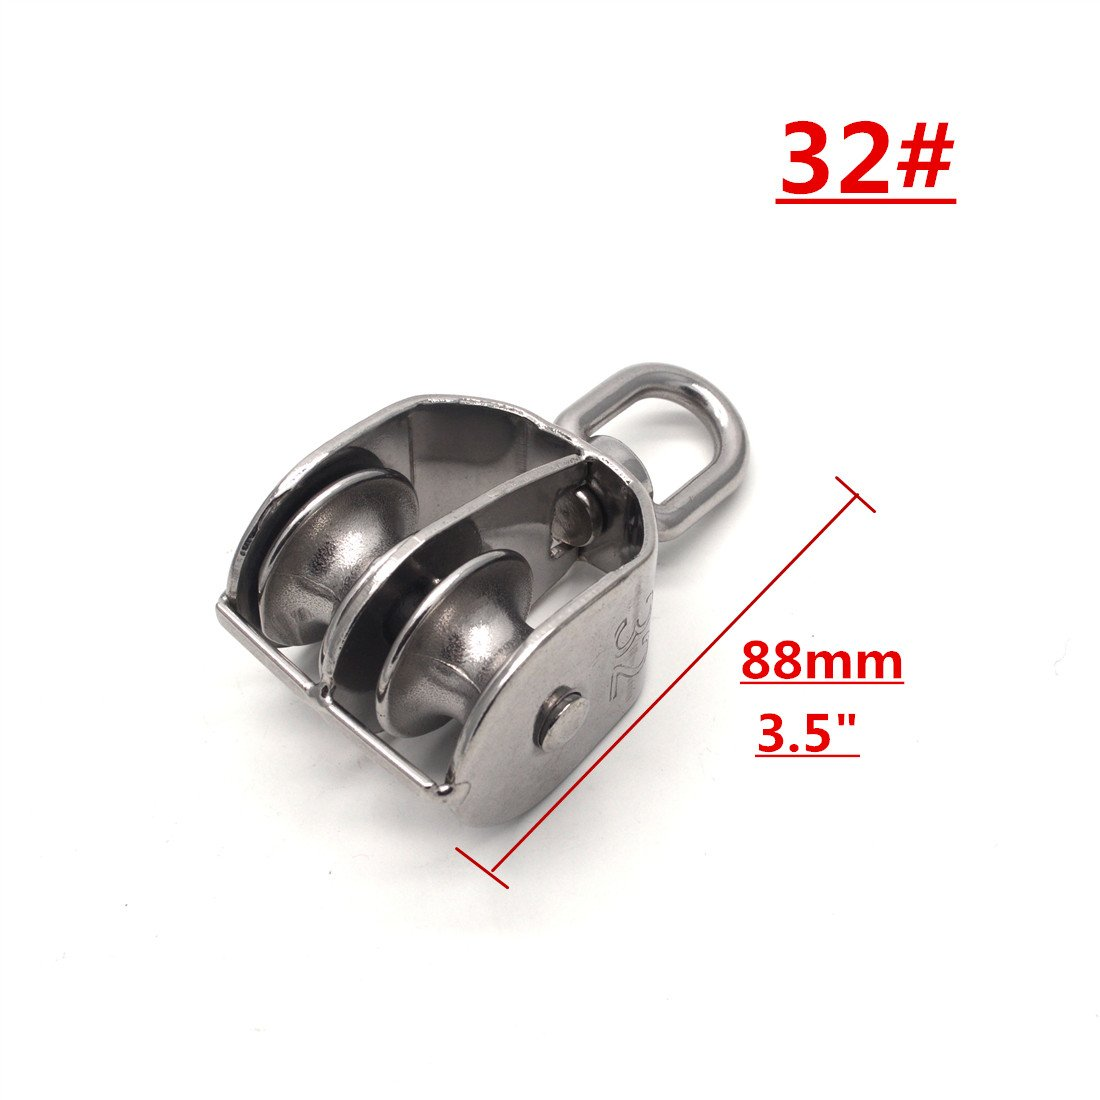 Sydien Sydien 32M/1.26 Inch 304 Stainless steel Double Pulley Block Double Wheel Swivel Pulley Block Loading 250kg 1pcs